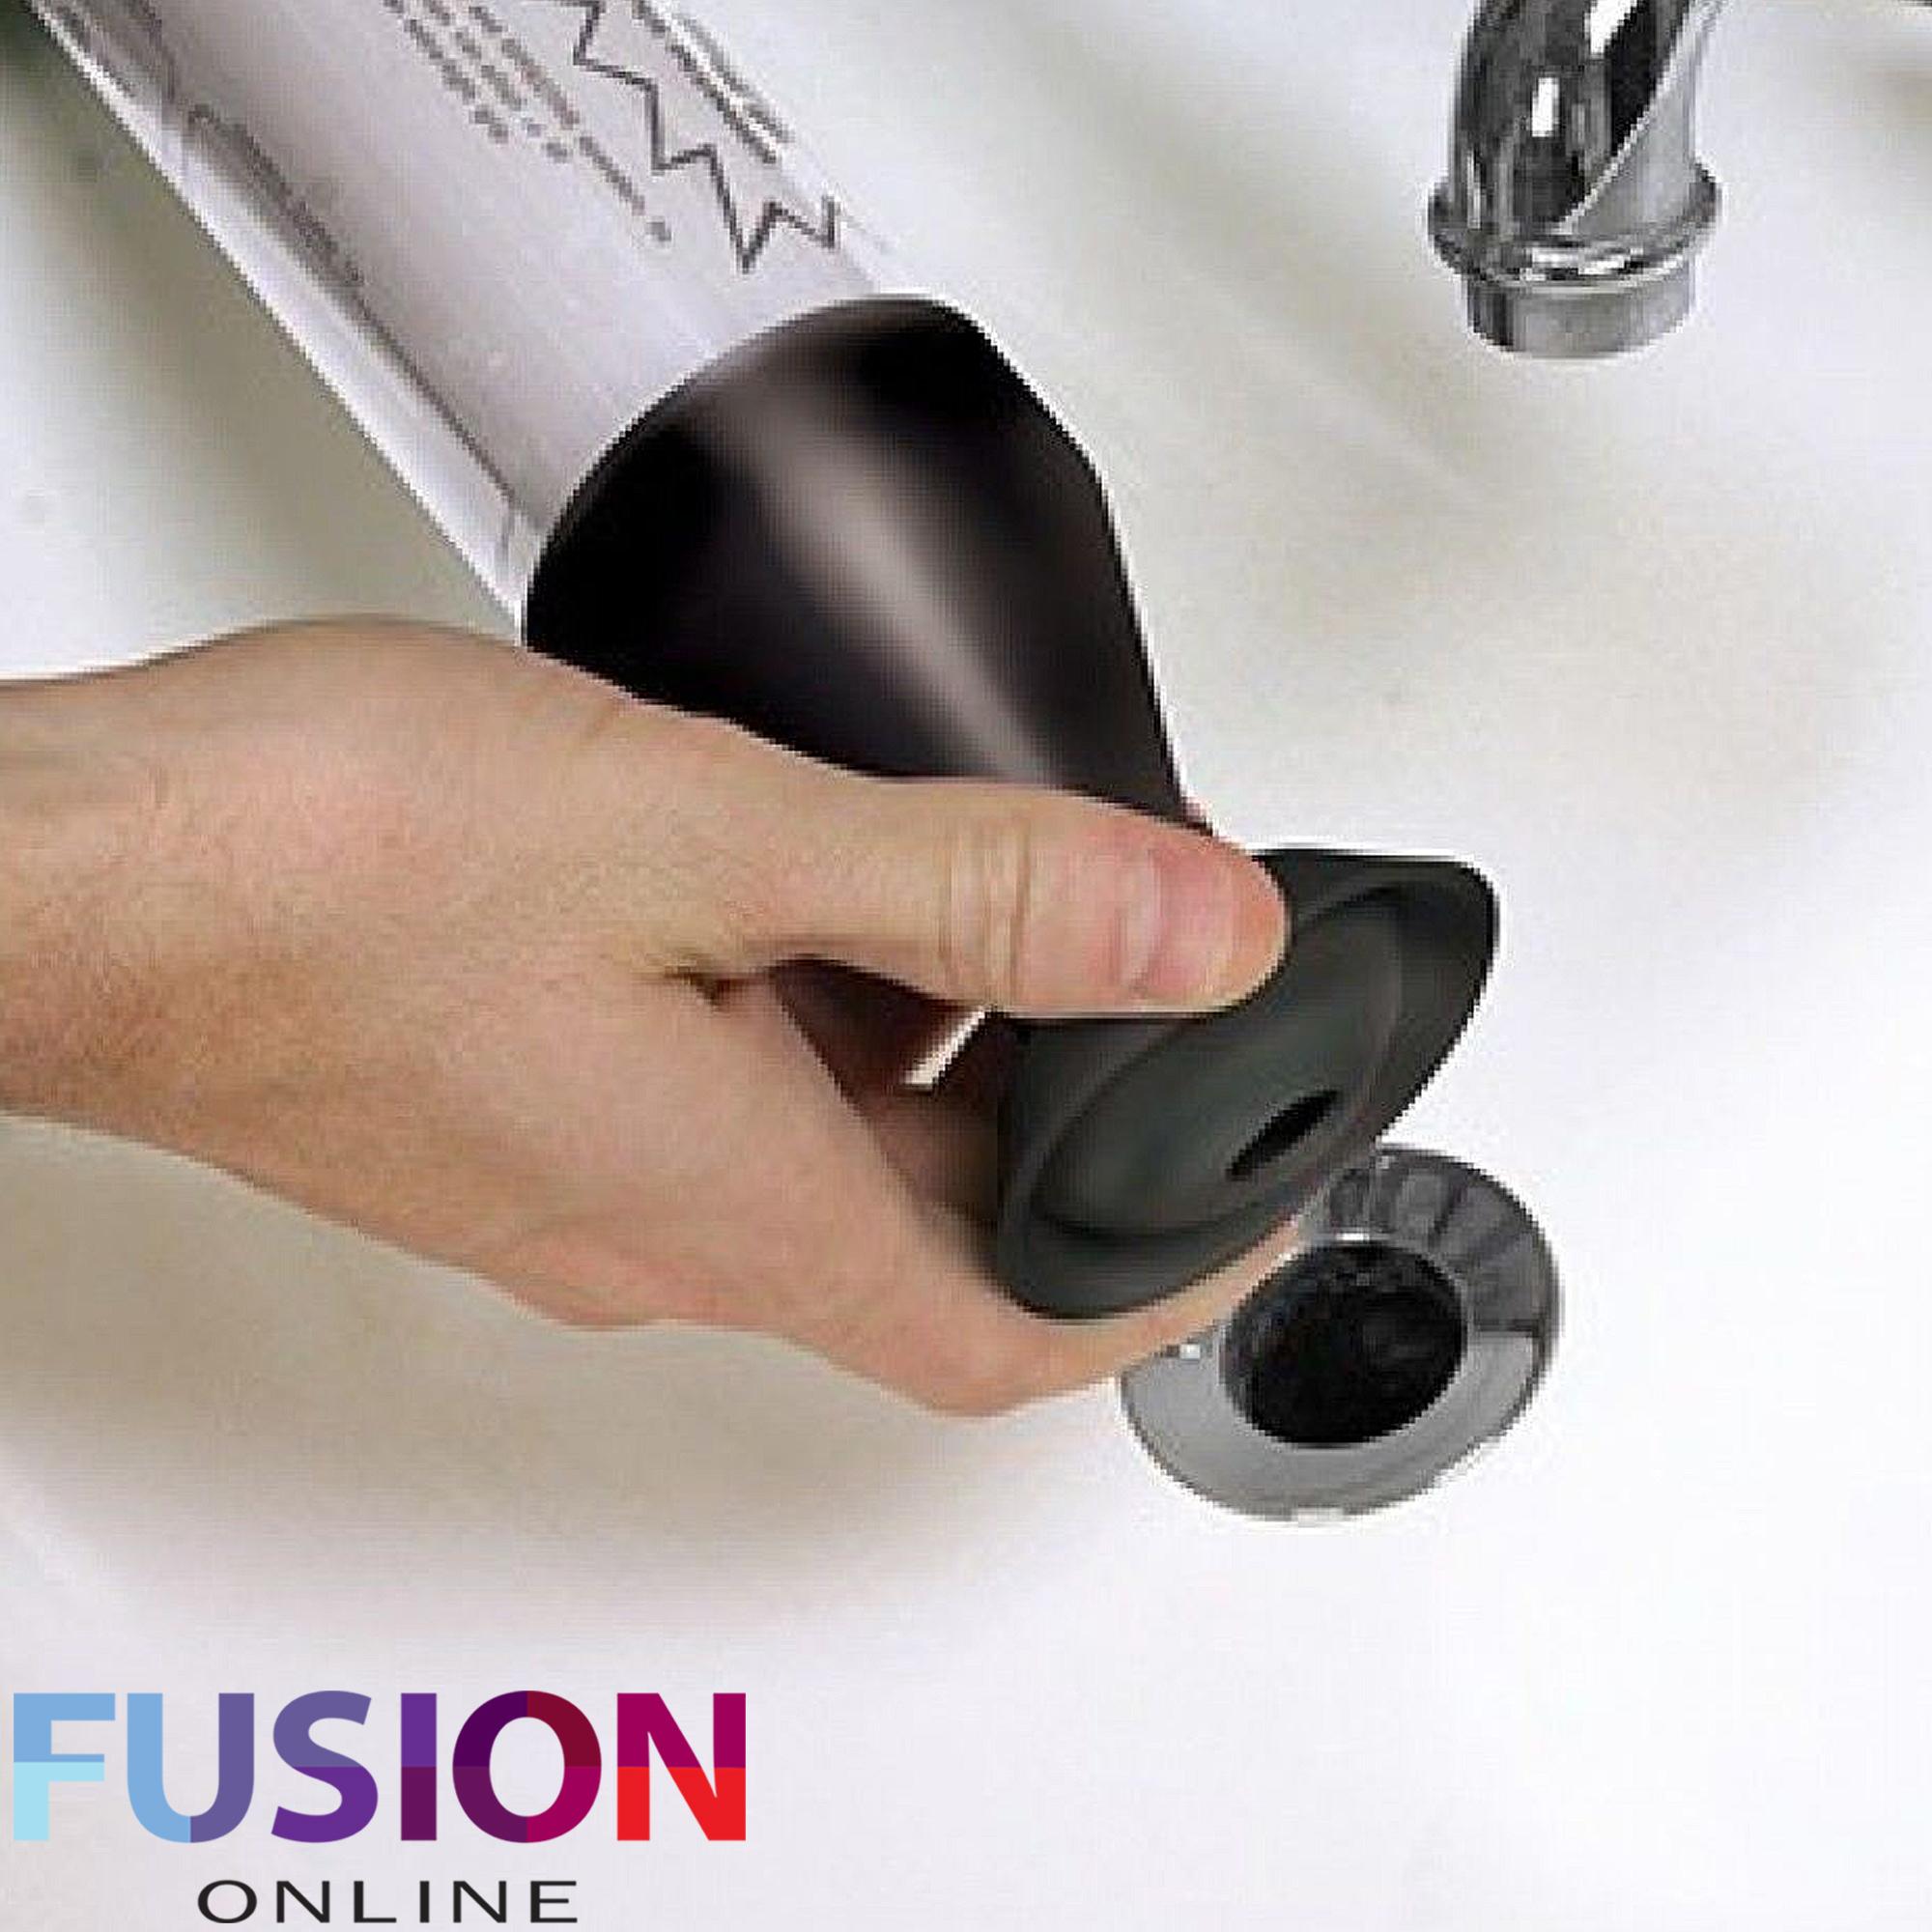 Drain Unblocker Plunger Buster Toilet Sink Clog Remover